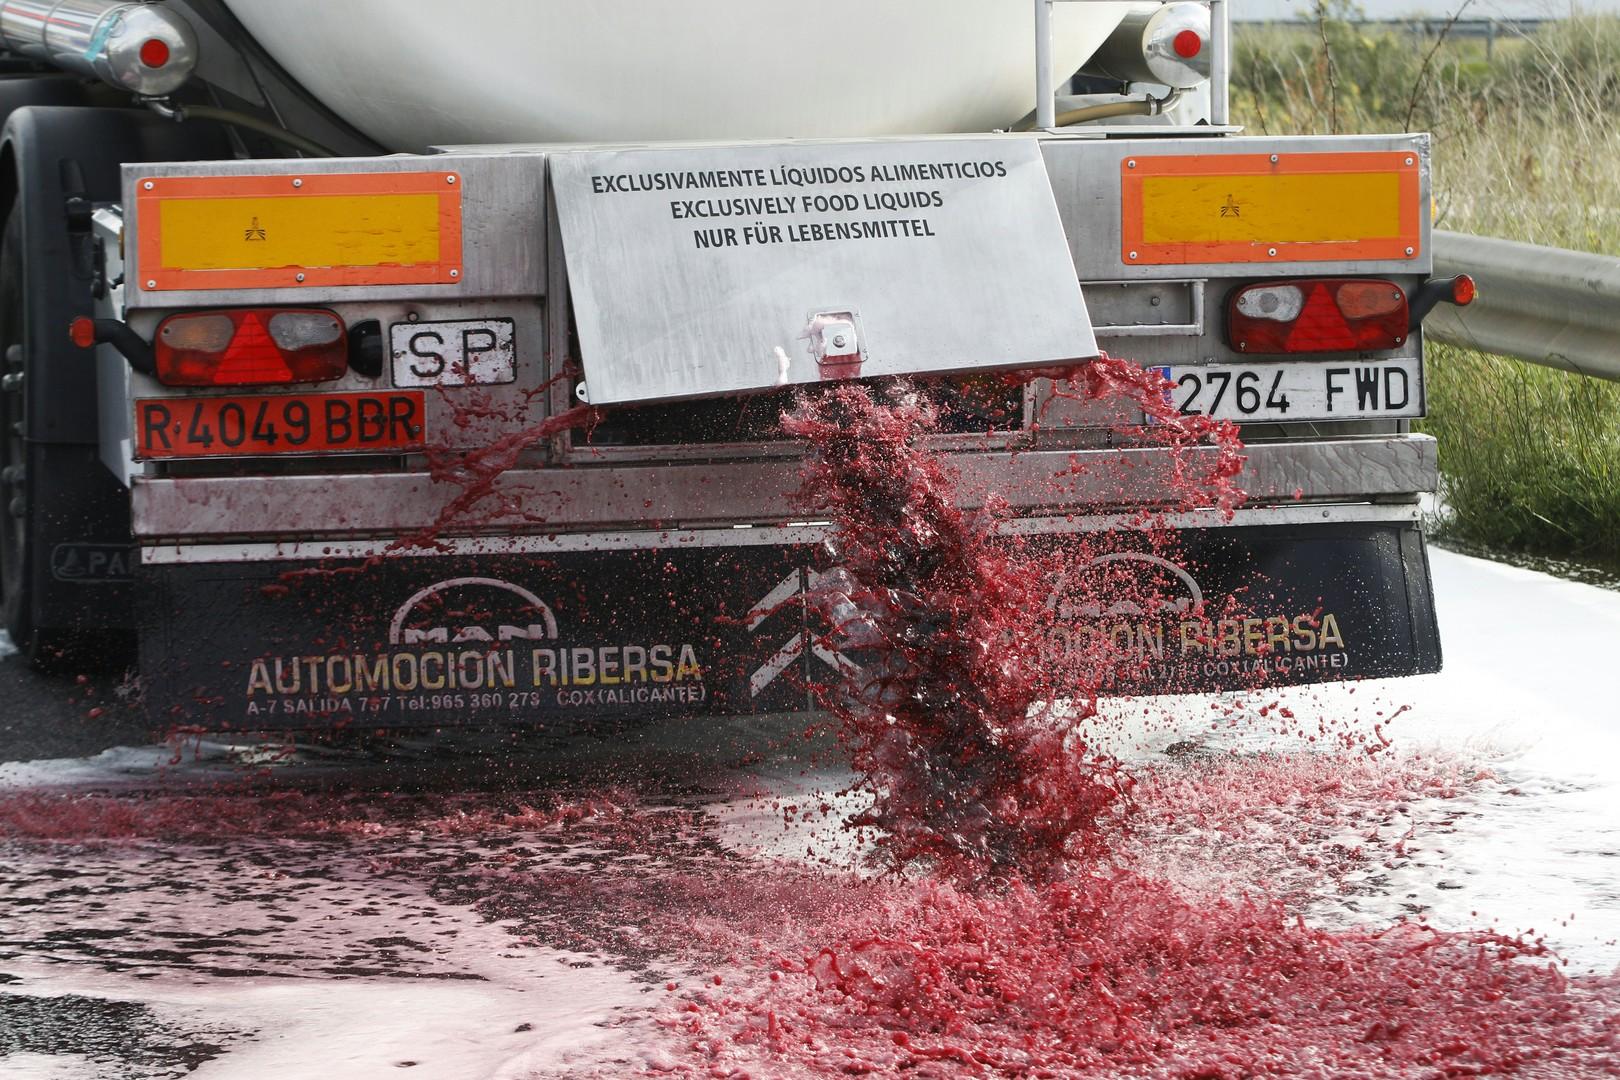 L'Espagne convoque l'ambassadeur de France après des attaques de citernes de vin